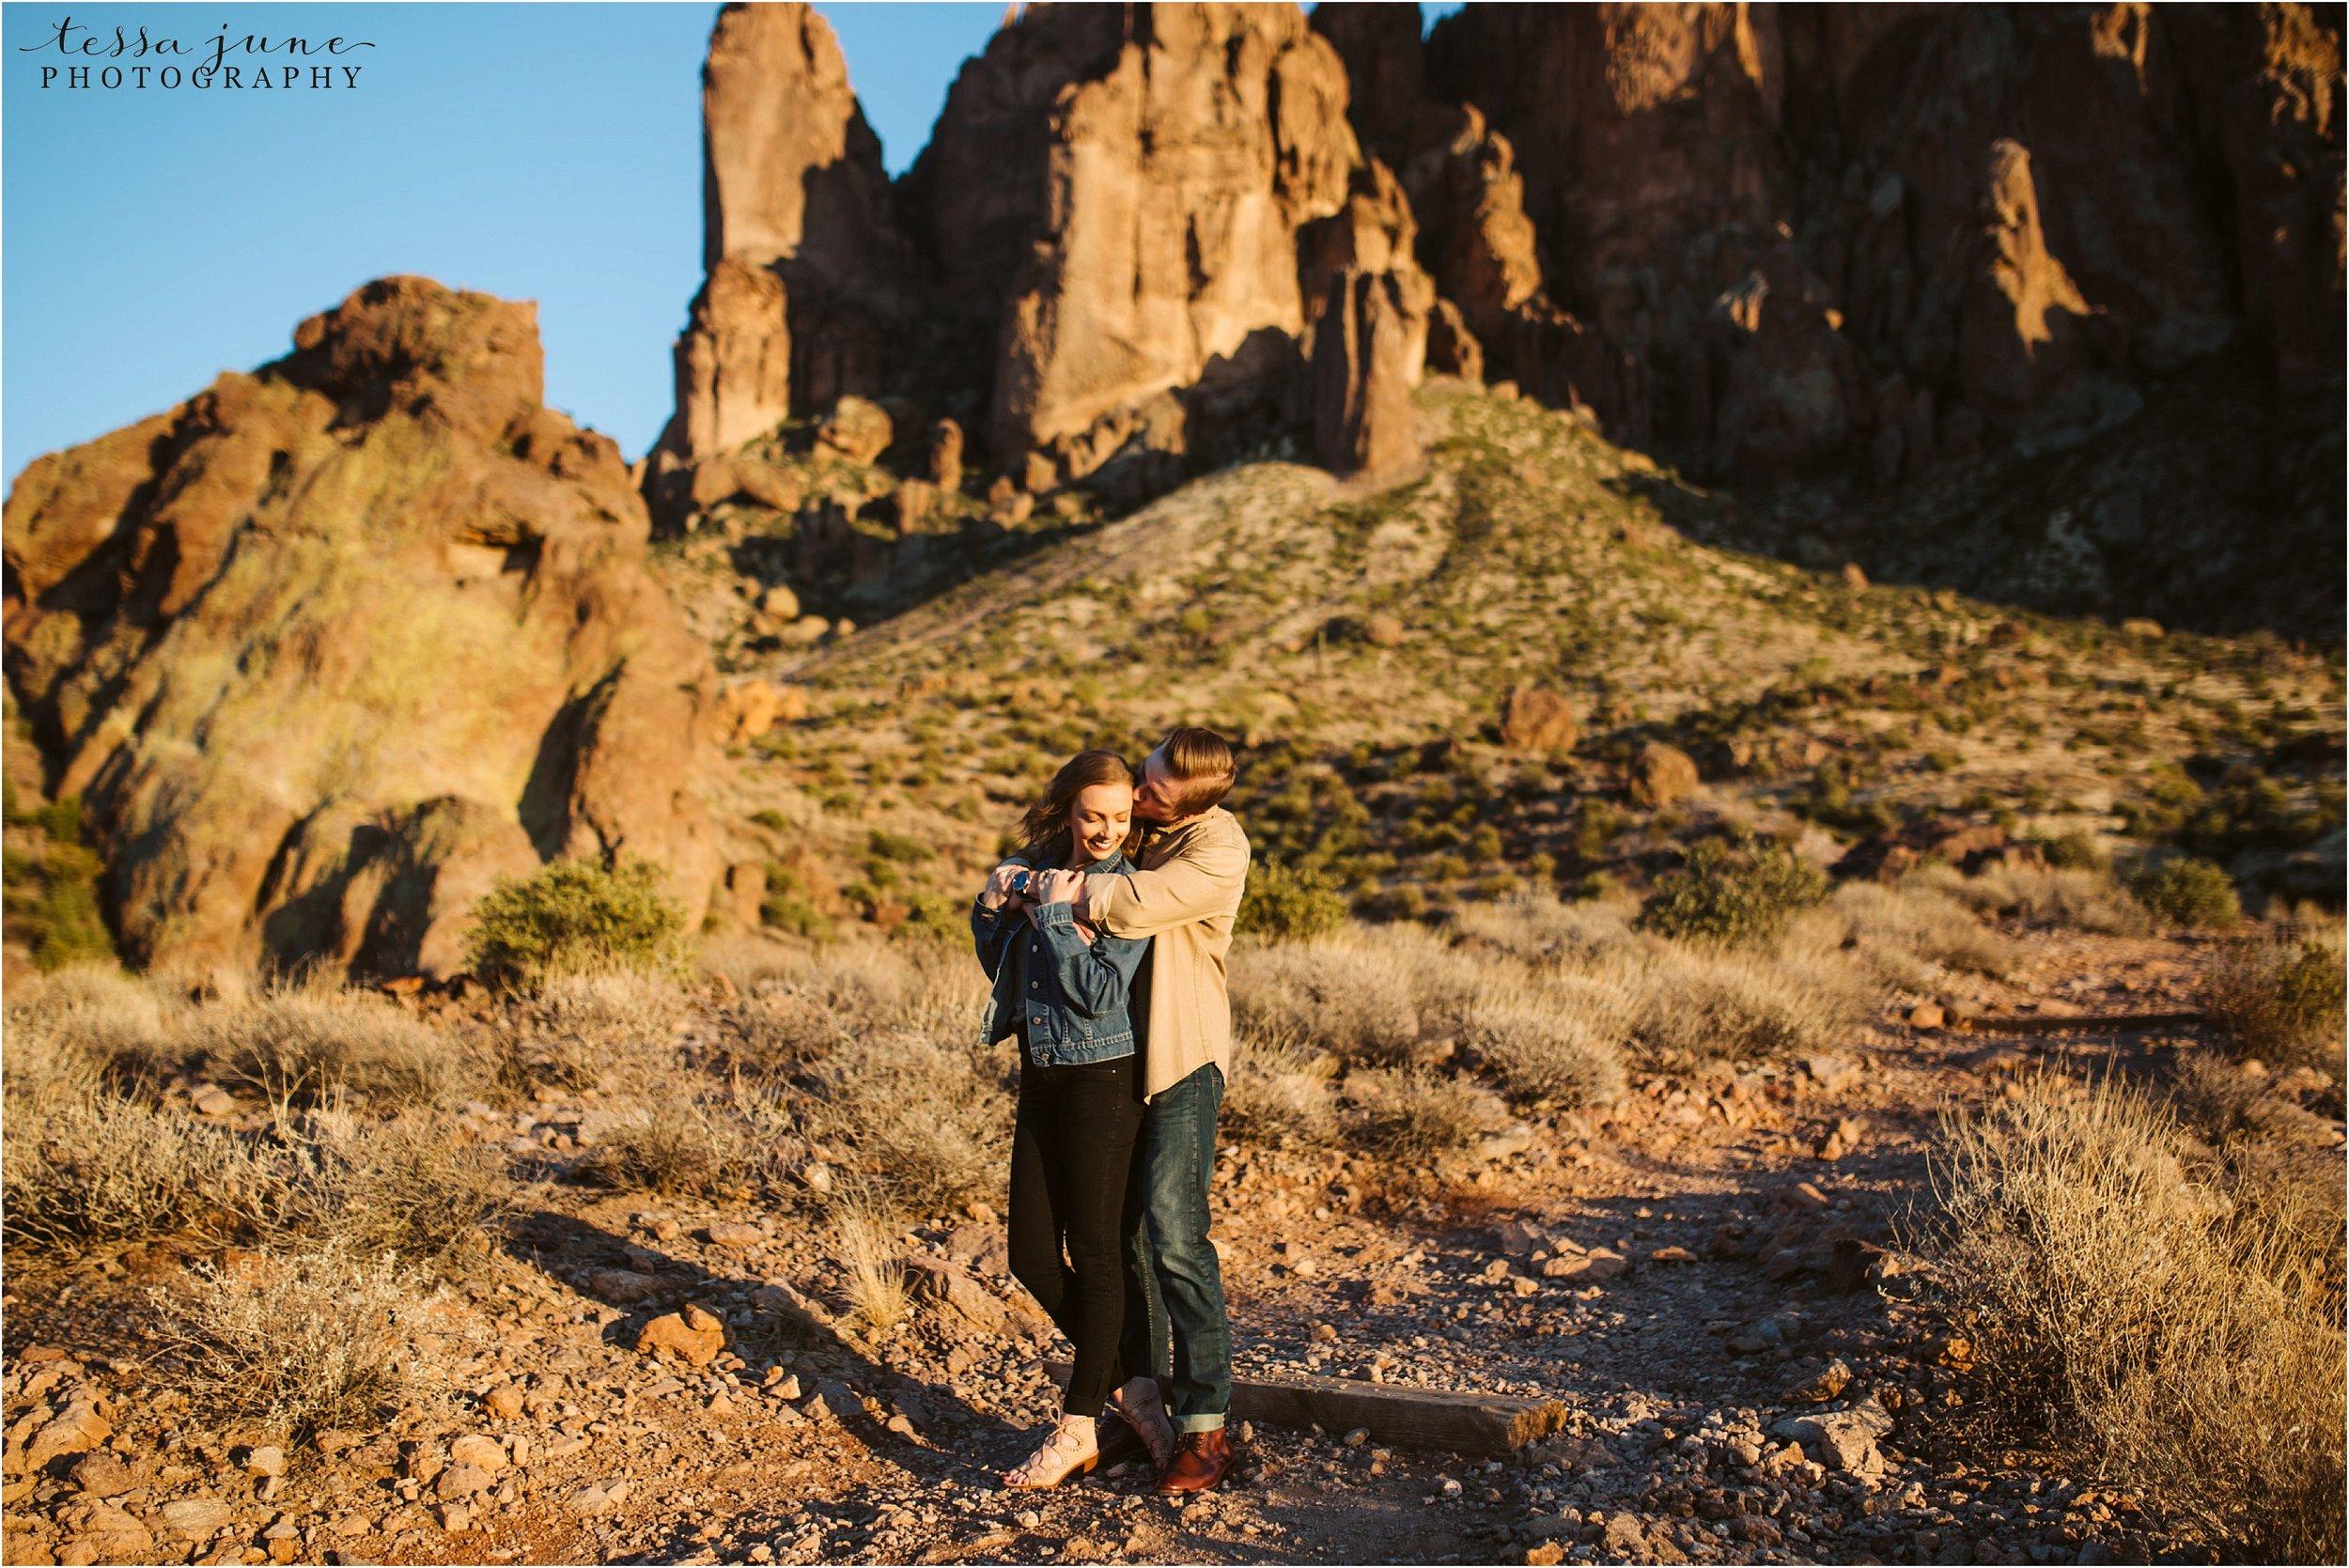 lost-dutchman-state-park-engagement-arizona-destination-photographer-phoenix-8.jpg